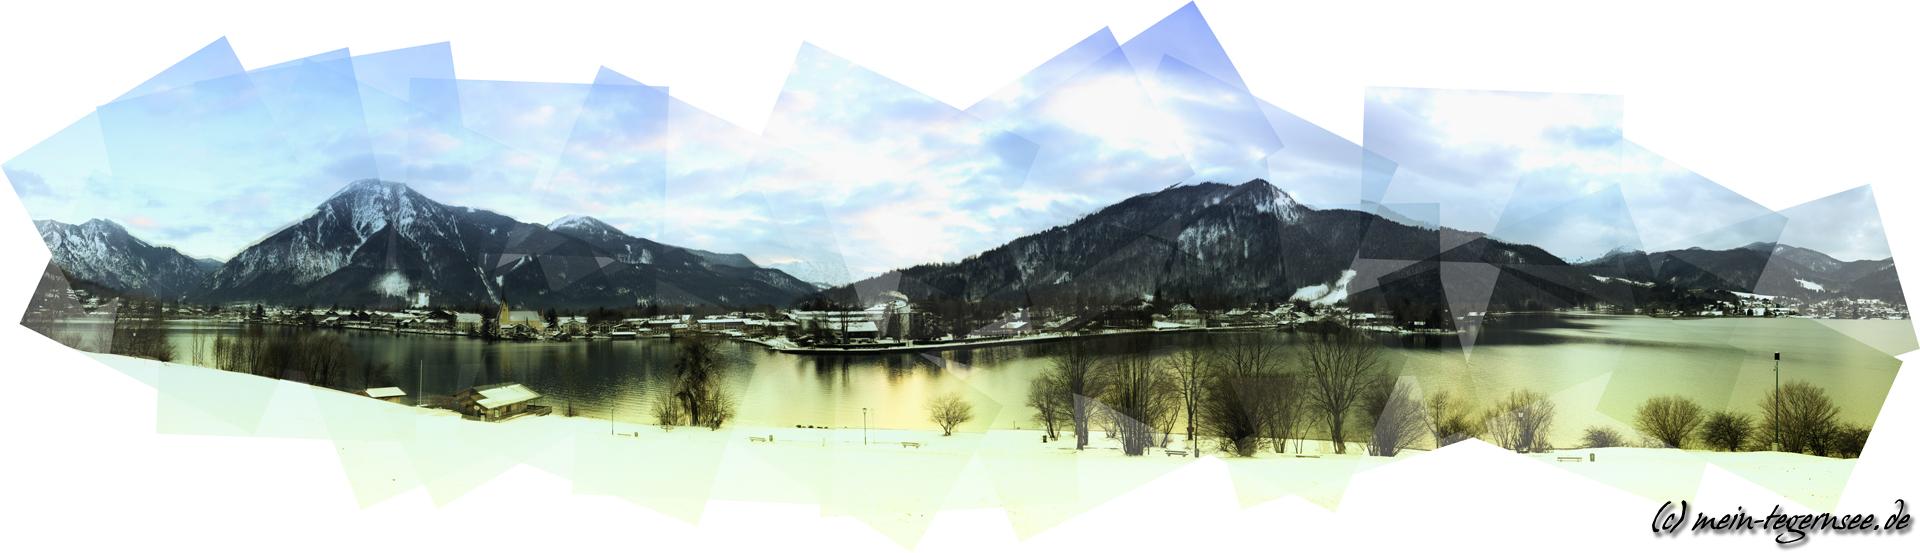 Rottach-Egern am Tegernsee mit Wallberg width=